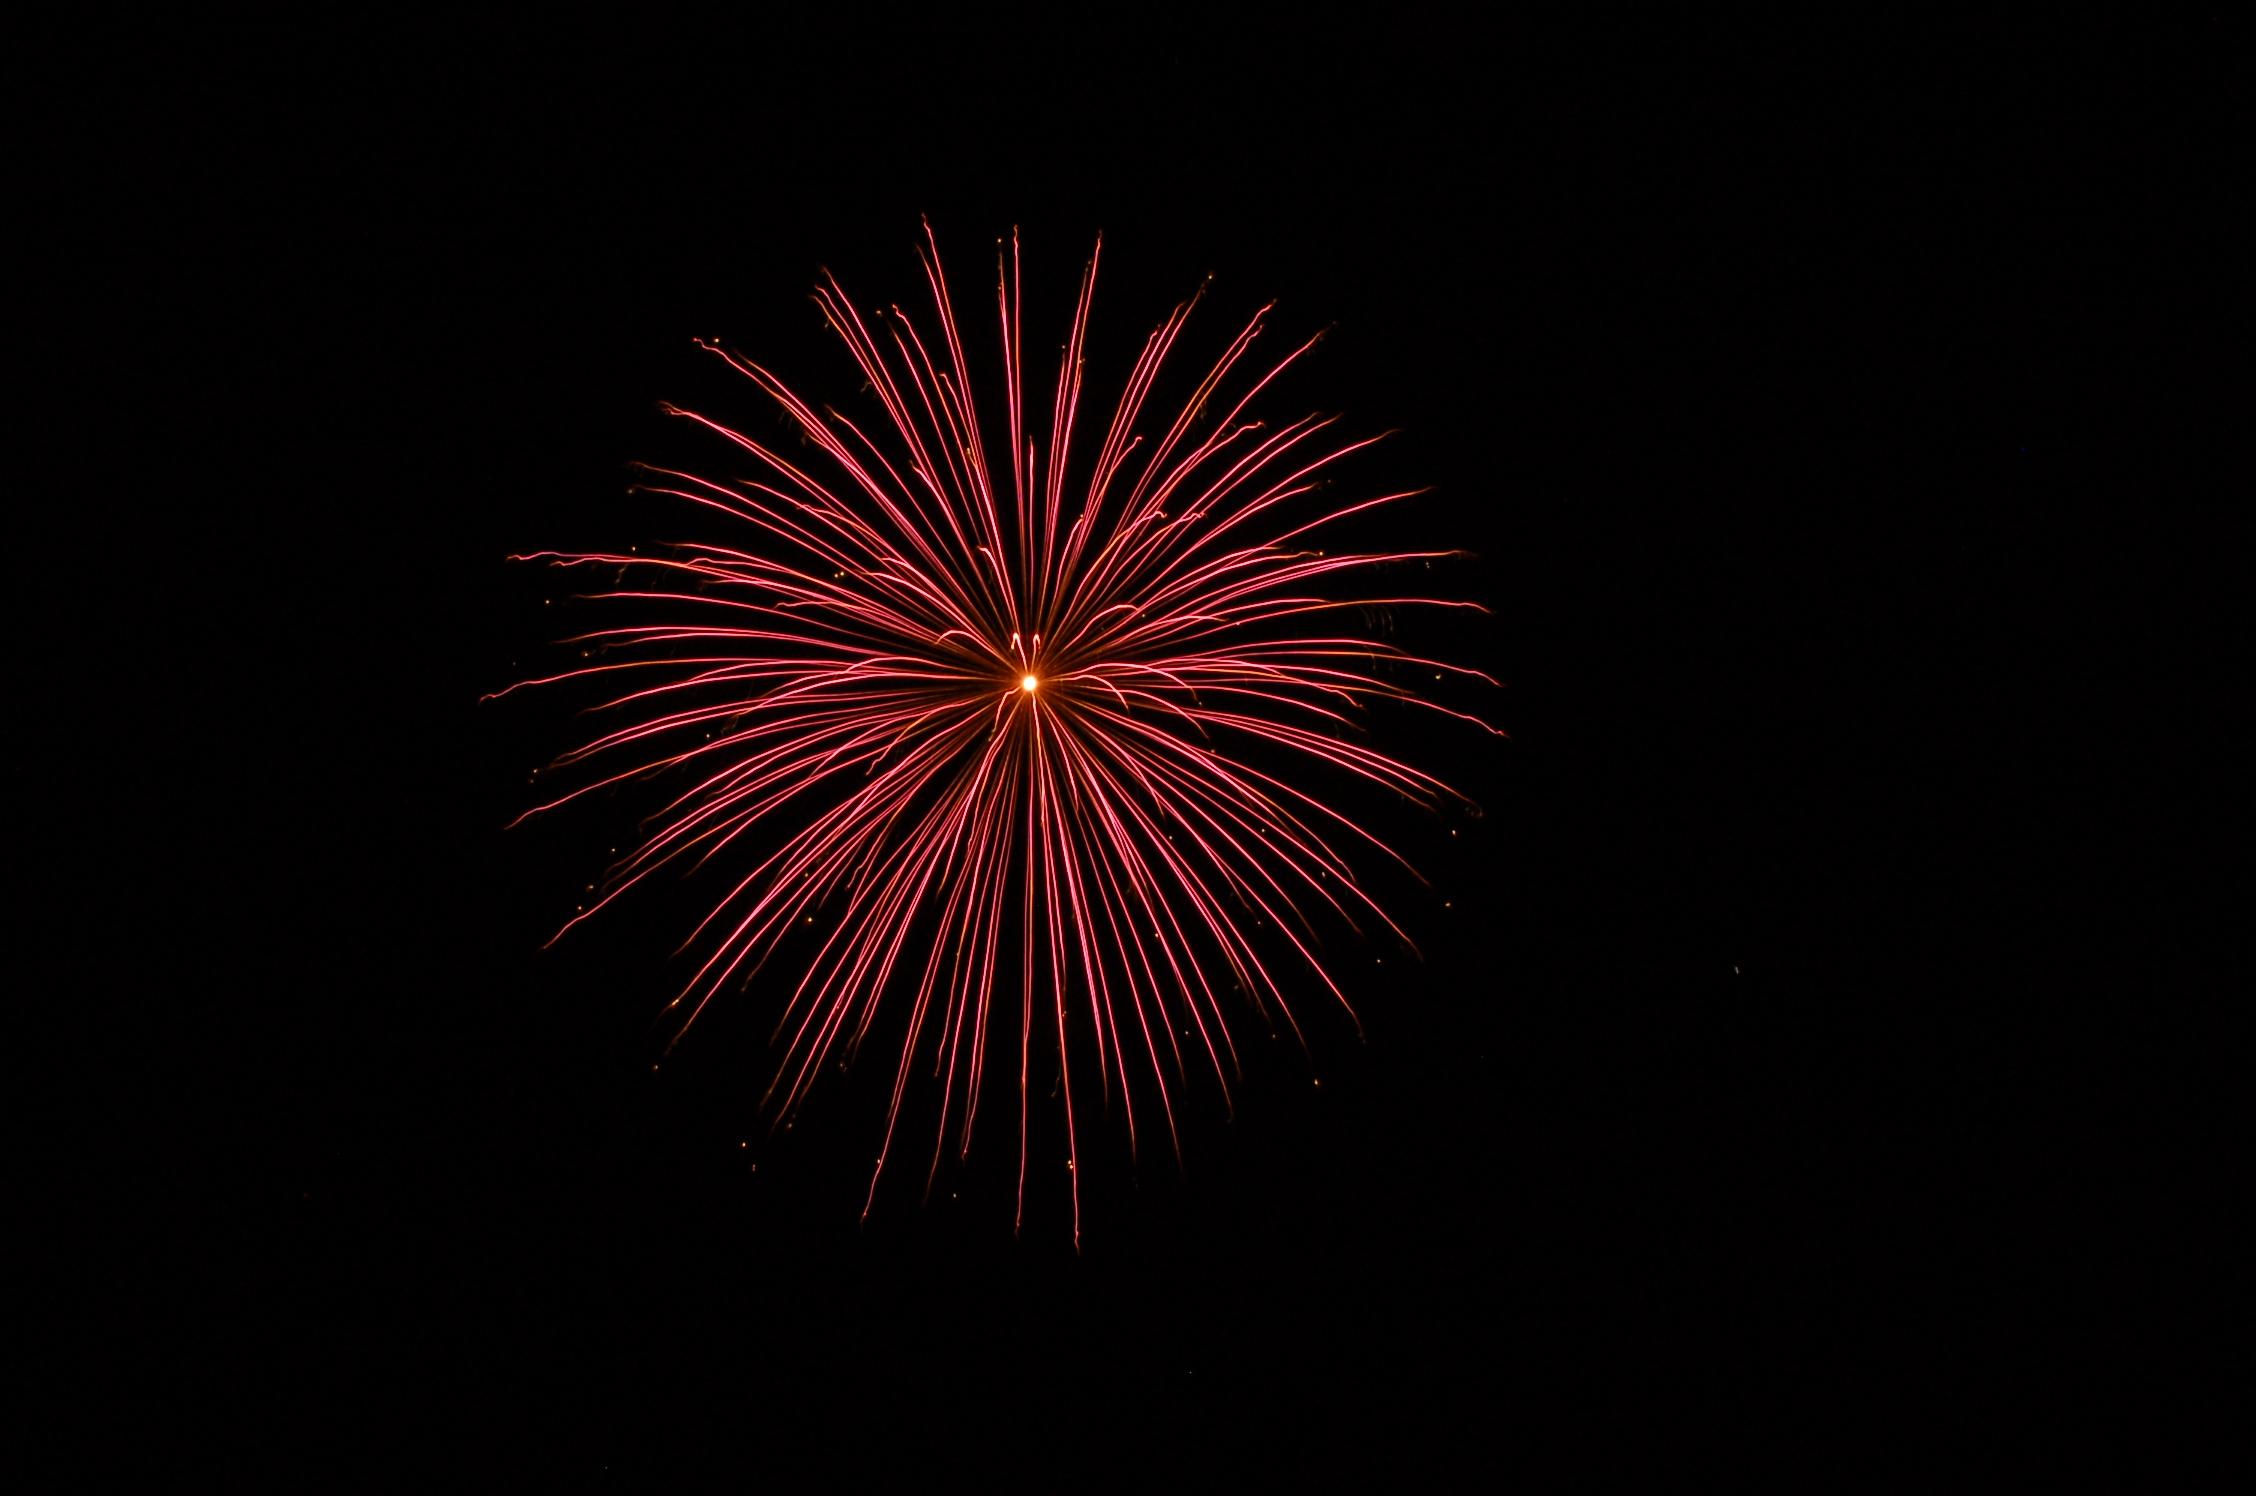 FA_Fireworks_Fireworks040.JPG